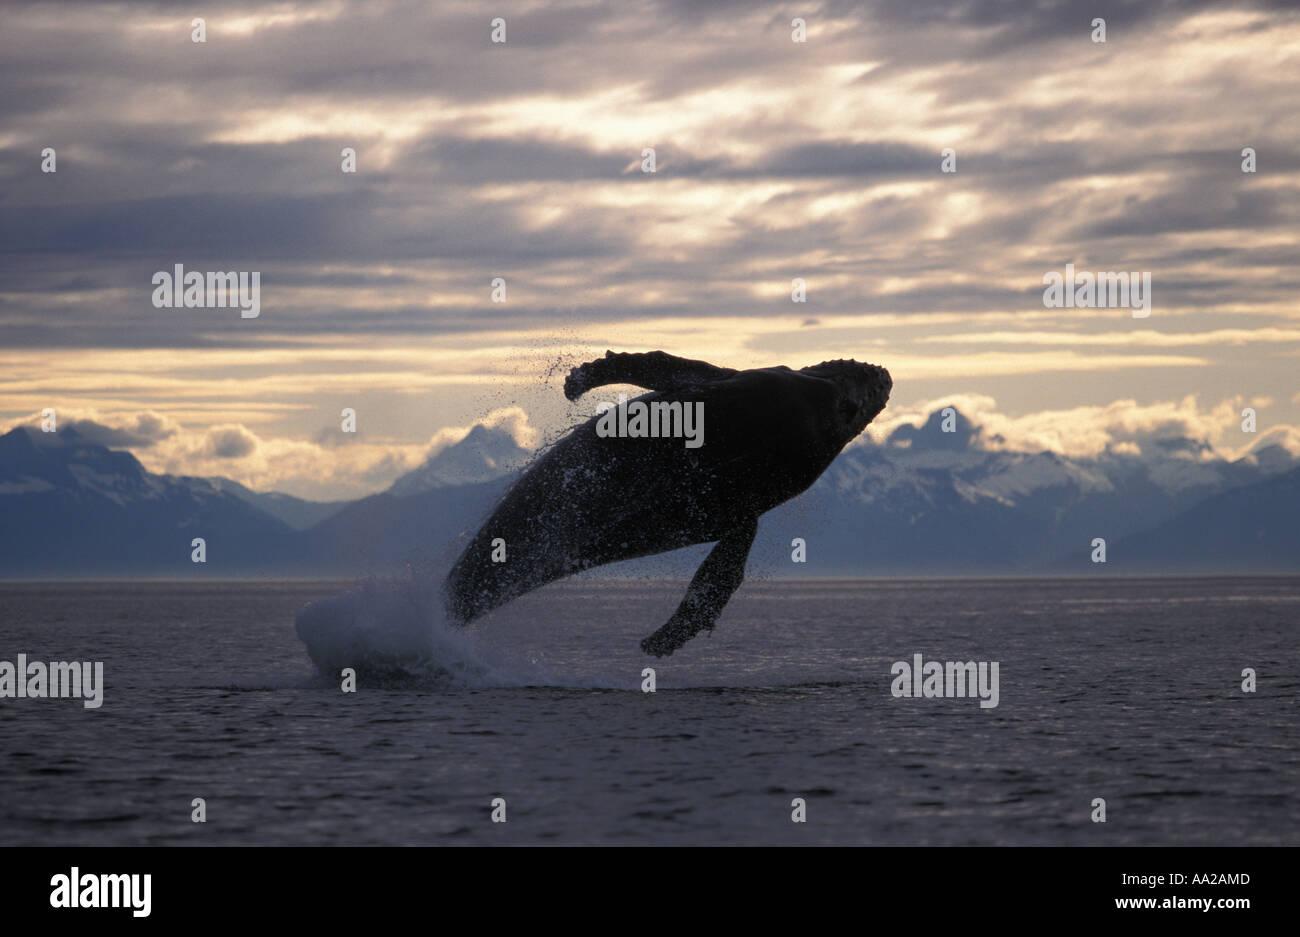 mi25 Humpback Whale, Megaptera novaeangliae, breaching. Alaska USA Pacific Ocean. Photo Copyright Brandon Cole - Stock Image